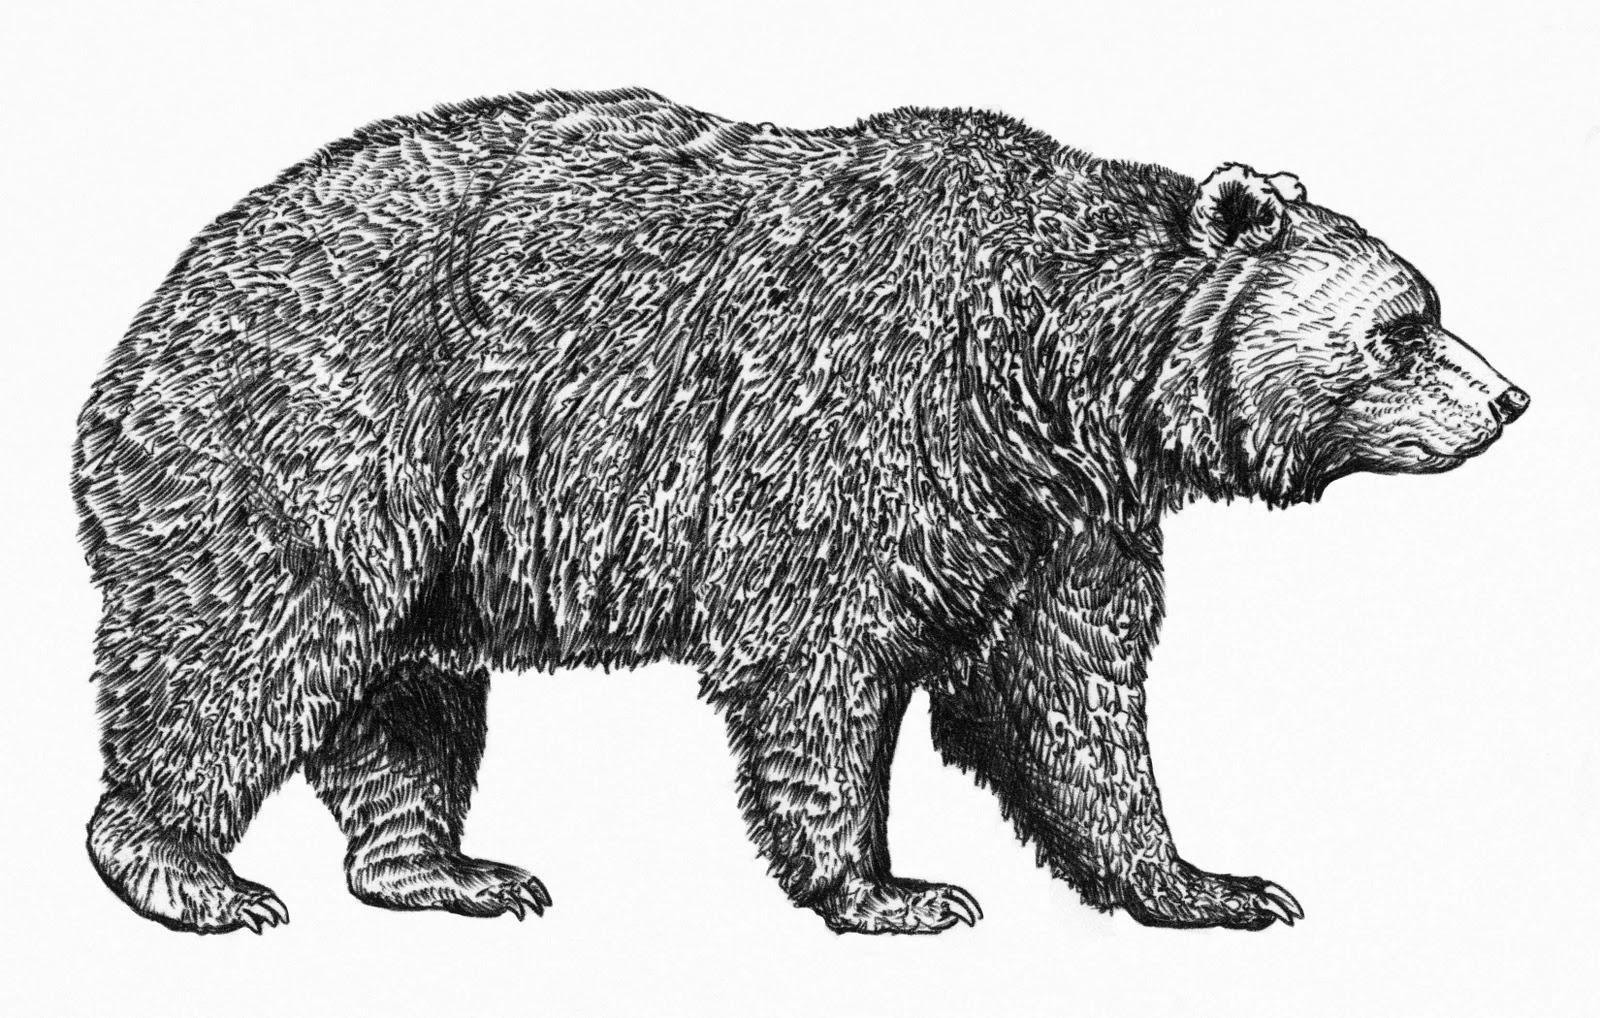 brown bear diagram of human teeth numbering charts black illustration